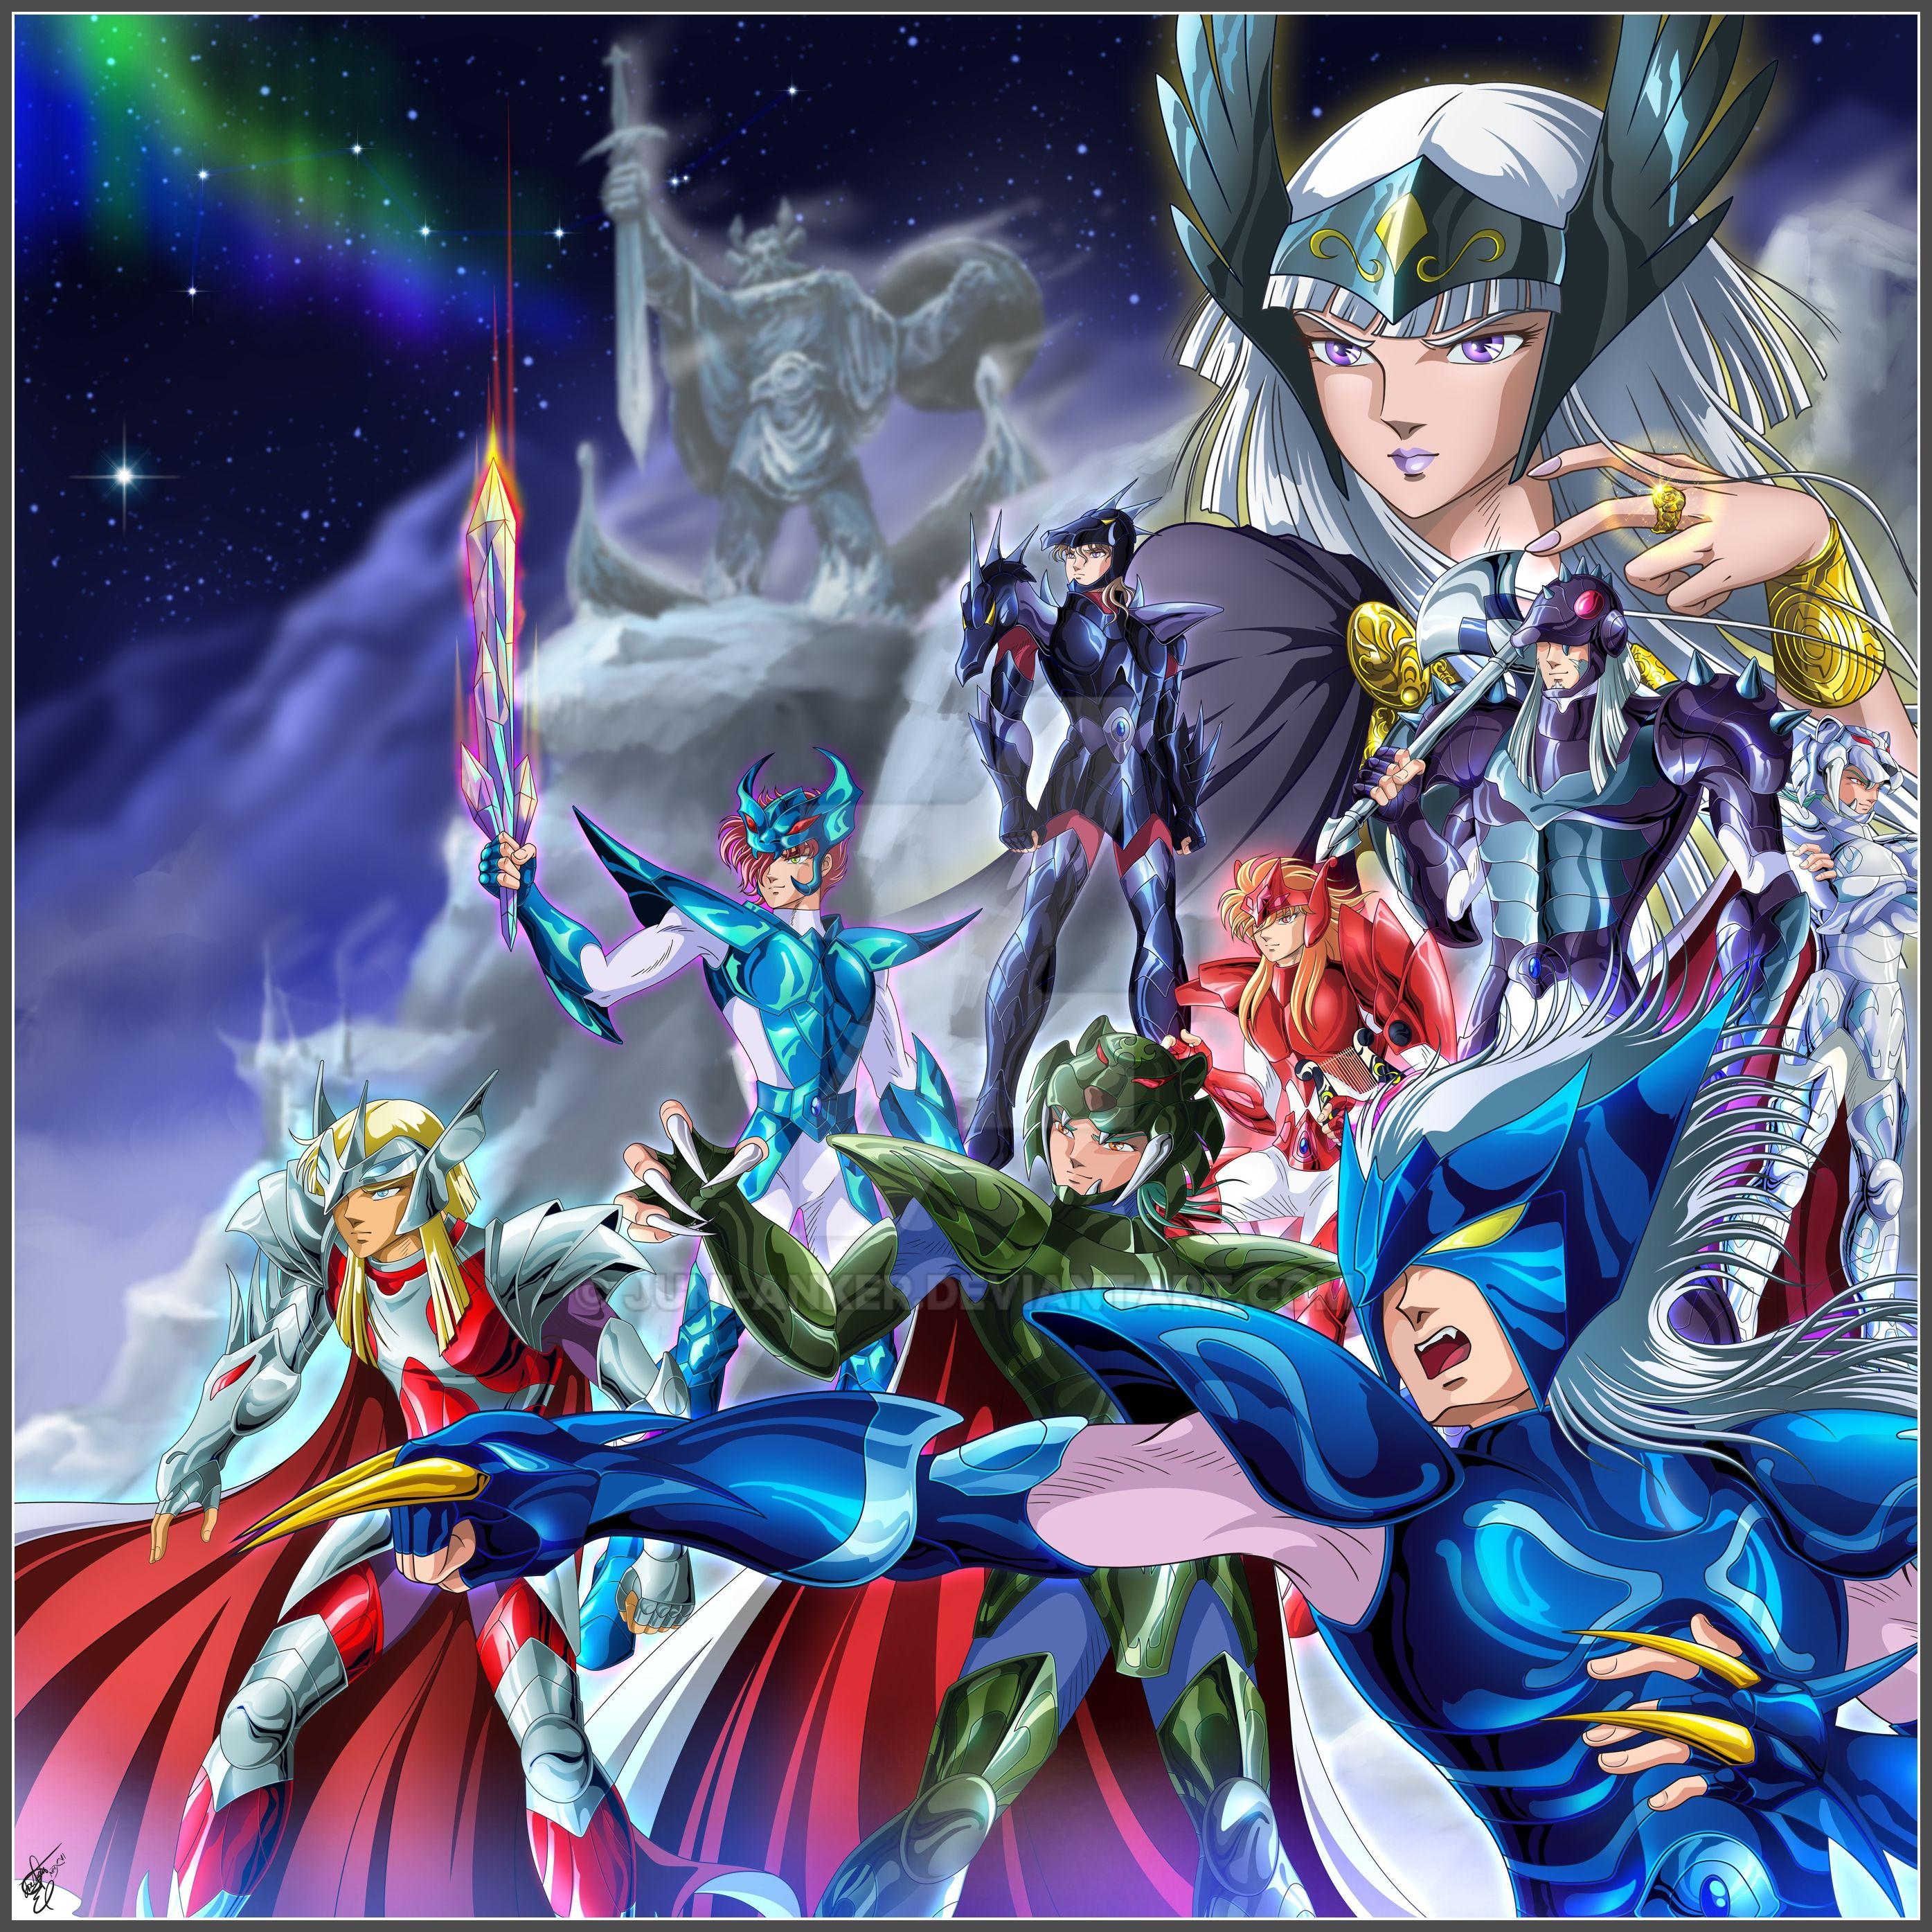 Saint Seiya Asgard By Juni-Anker On DeviantArt